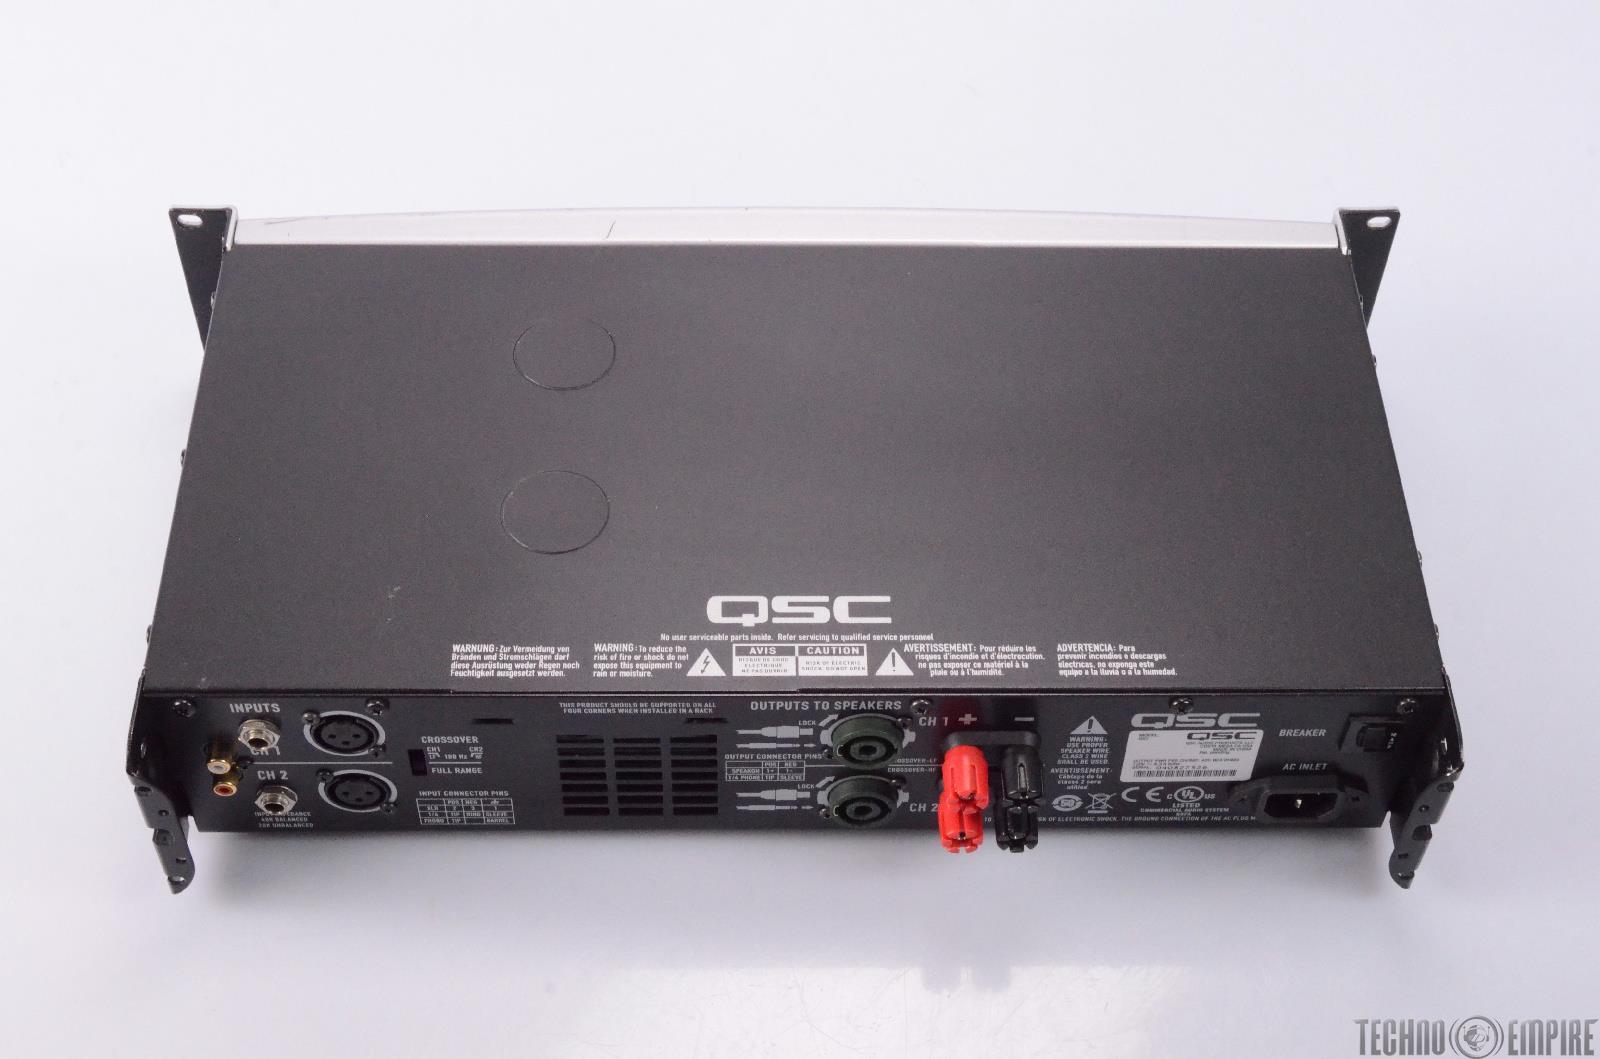 qsc gx3 425 watt 4 stereo power amplifier needs repair 27427 ebay. Black Bedroom Furniture Sets. Home Design Ideas